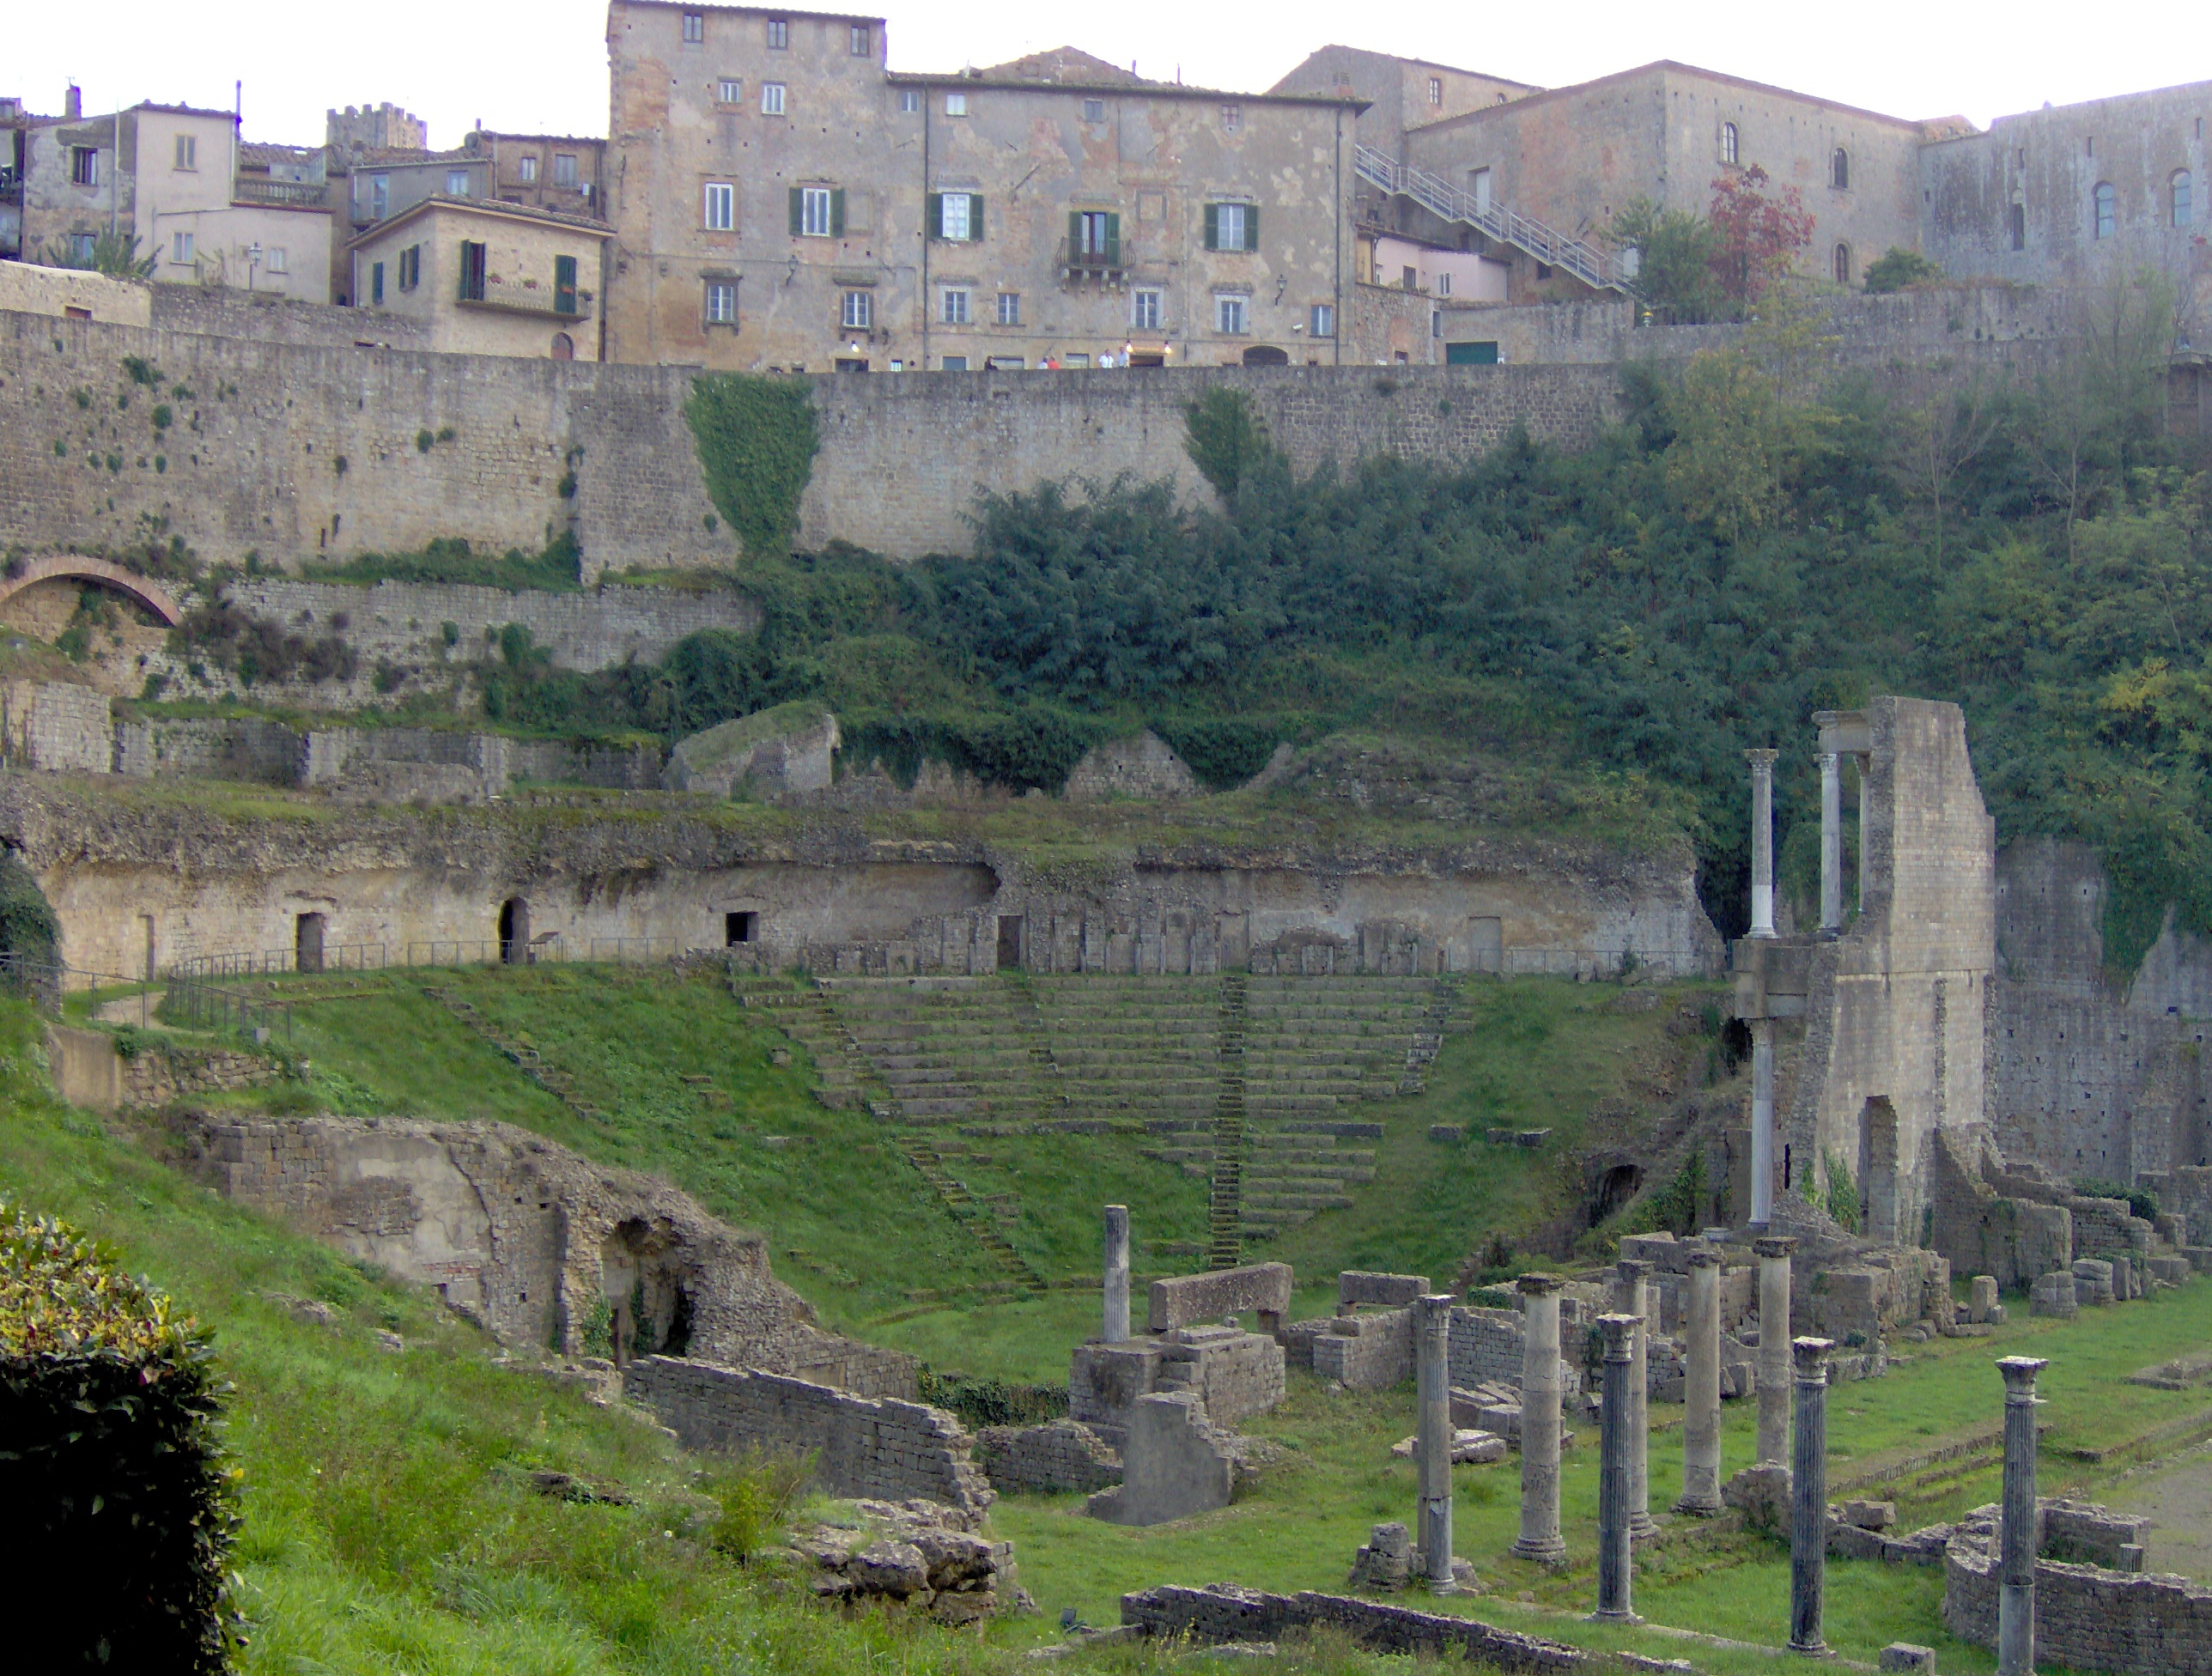 Volterra Italy  city images : Volterra ruines 2 Wikimedia Commons